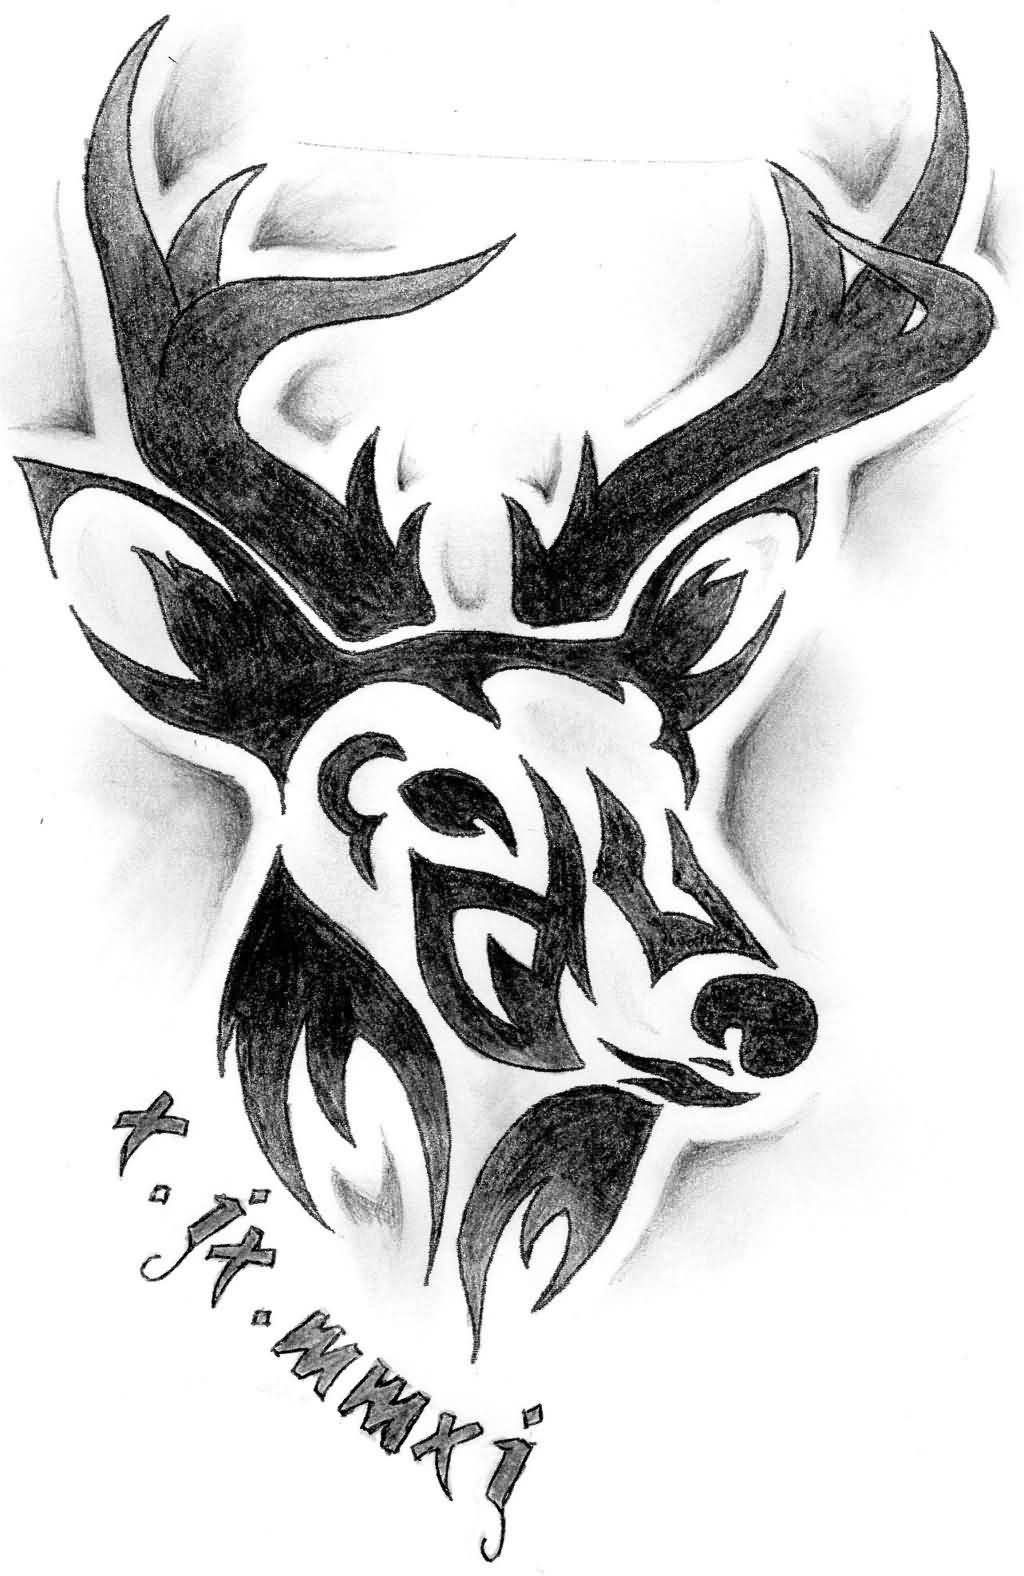 Amazing Tribal Deer Head Tattoo Design Idea Deer Tattoo Designs Deer Tattoo Deer Skull Tattoos